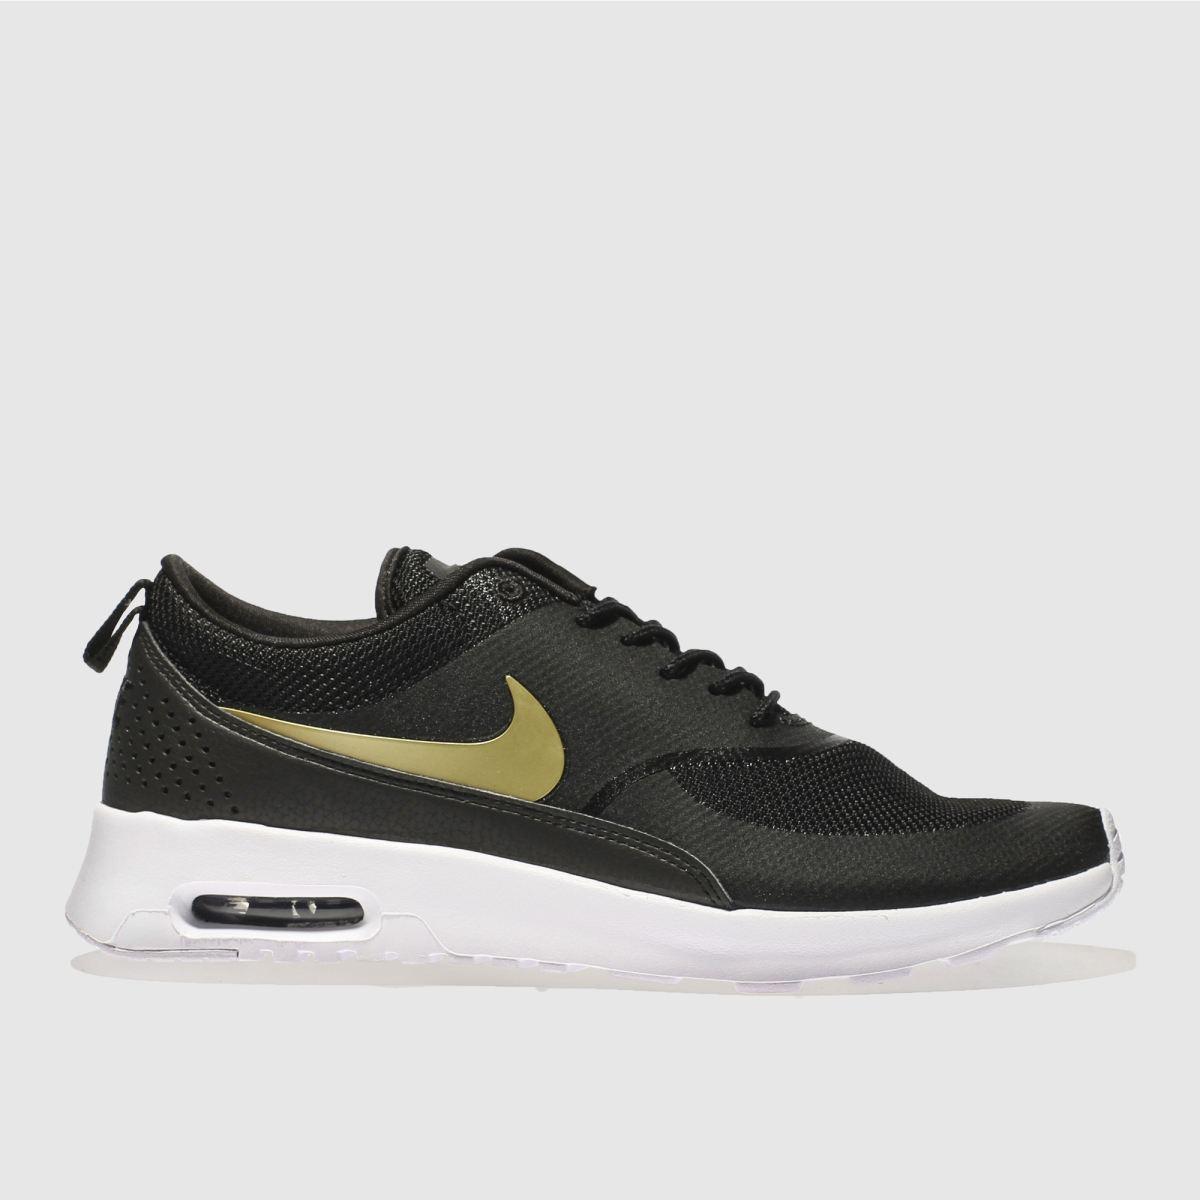 Nike Black & Gold Air Max Thea Trainers